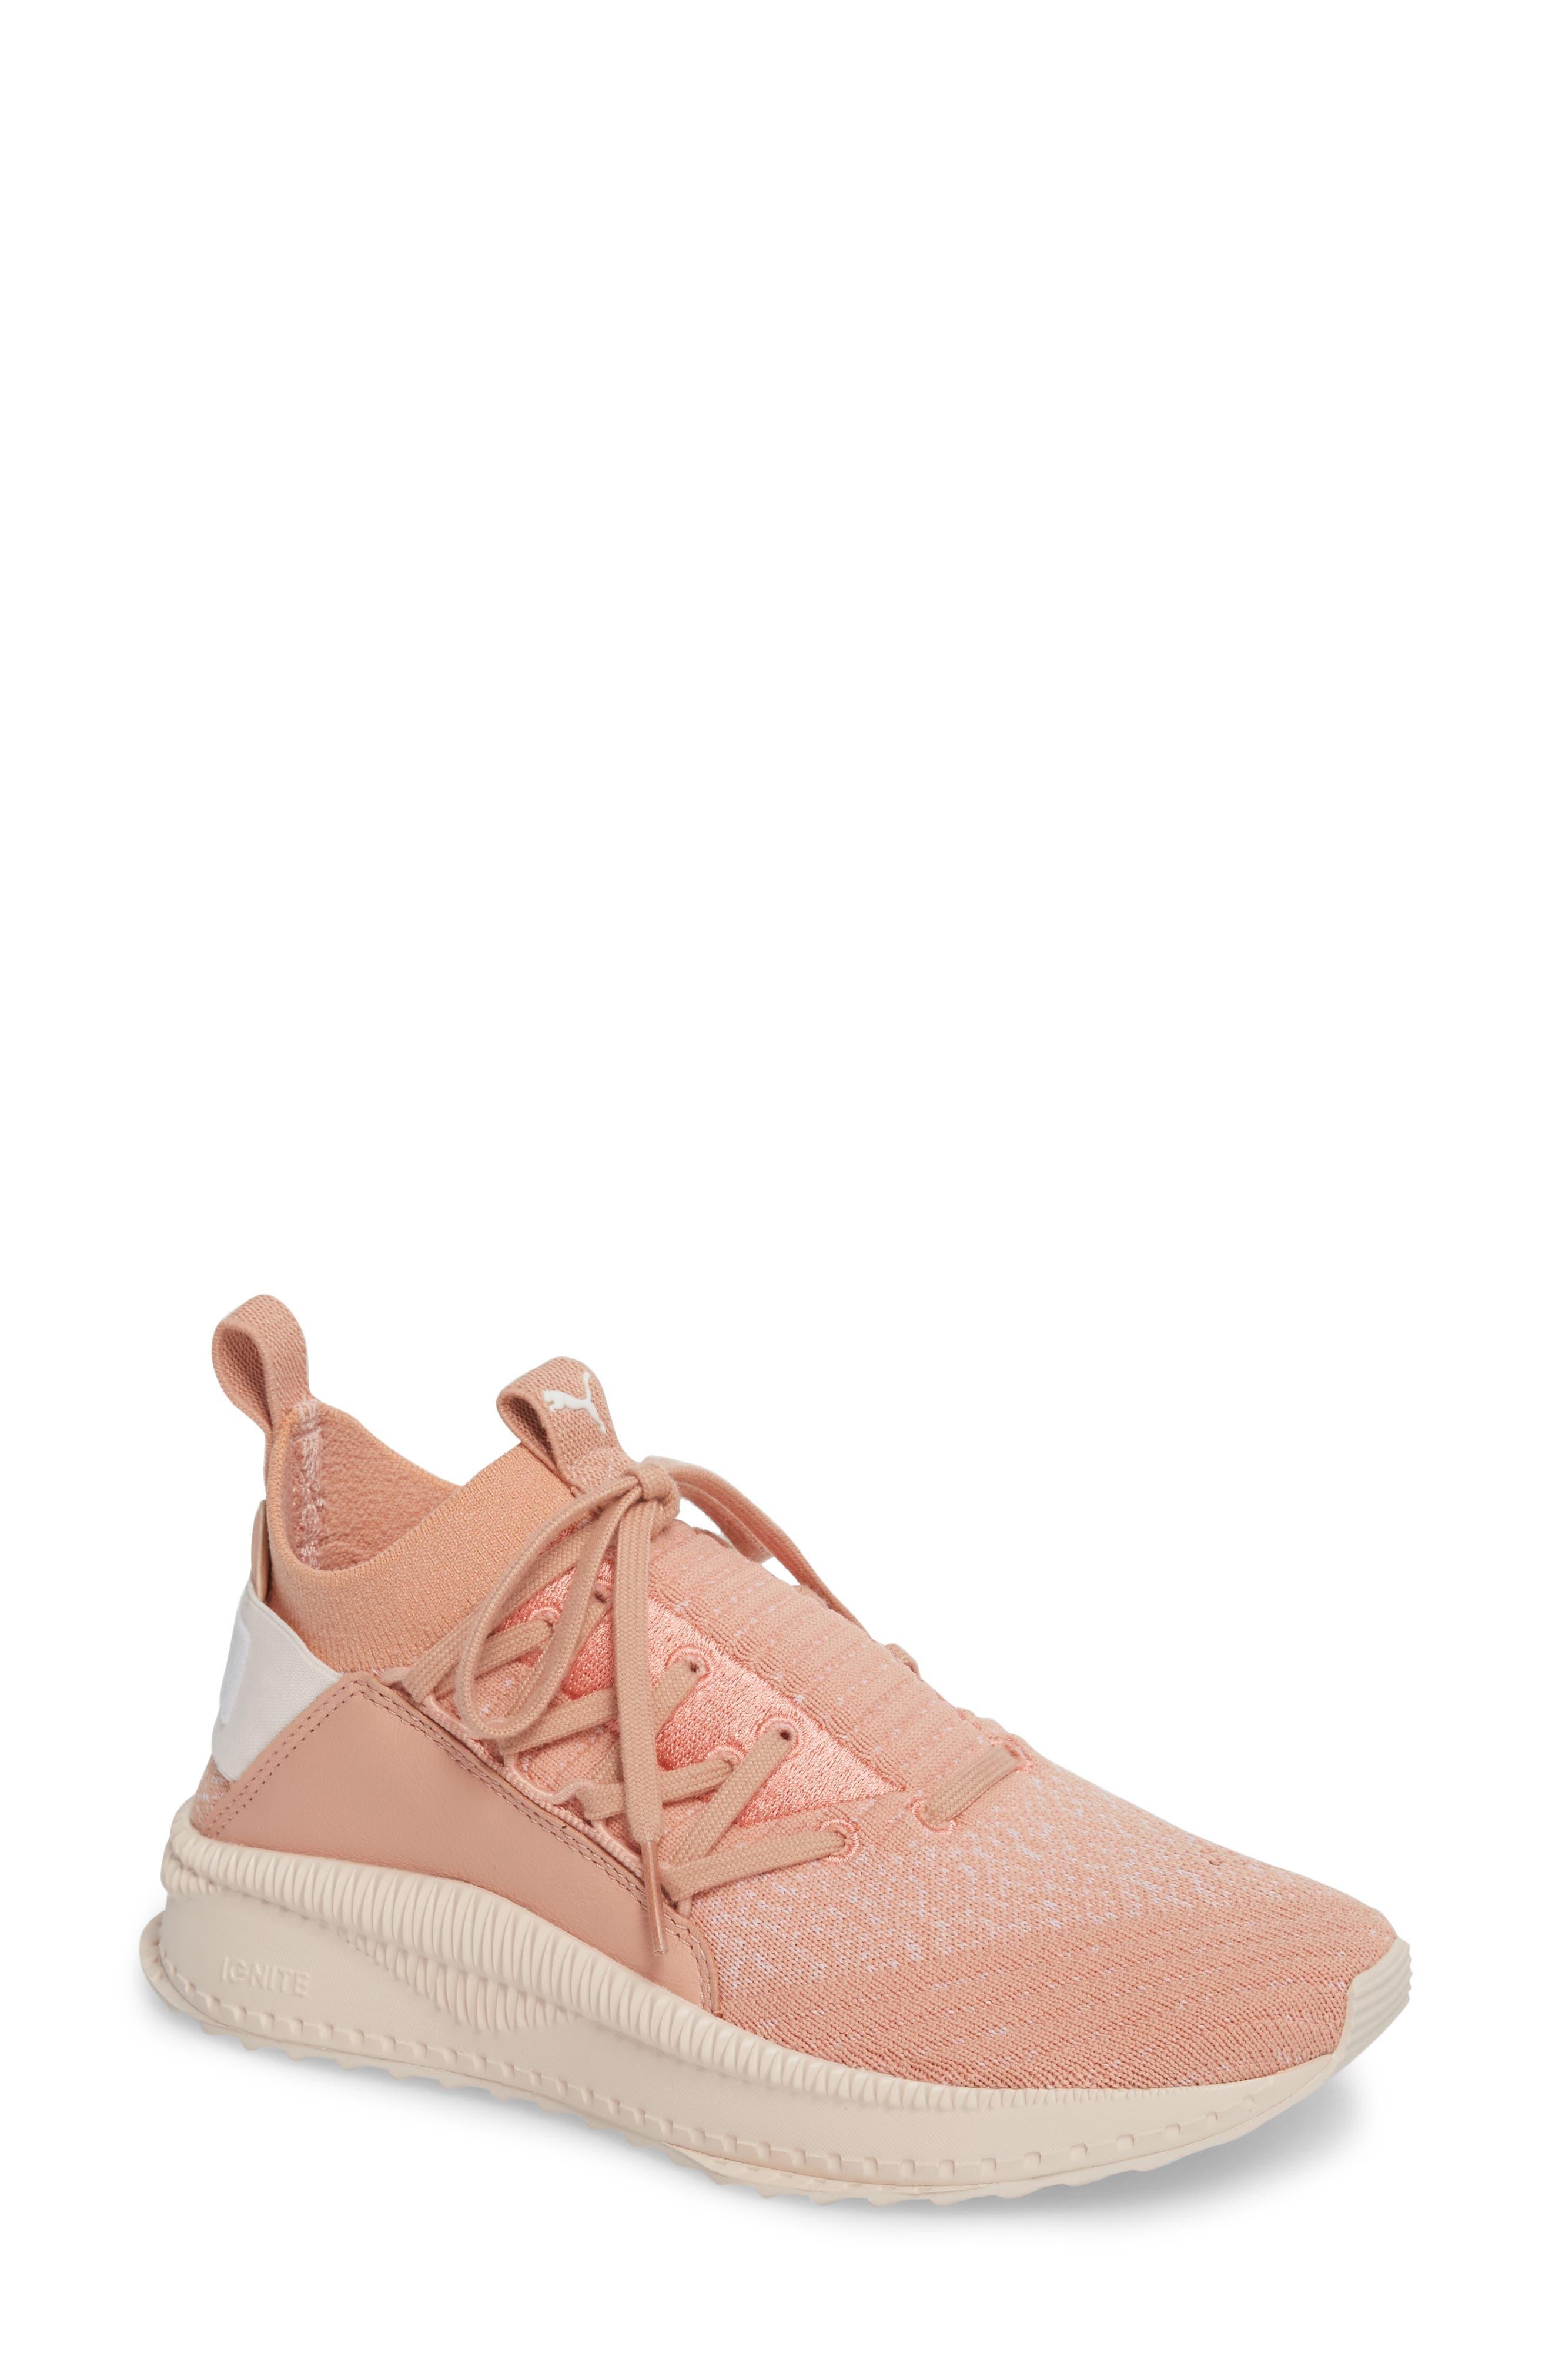 Tsugi Jun Knit Sneaker,                         Main,                         color, Peach Beige/ Puma White/ Pearl